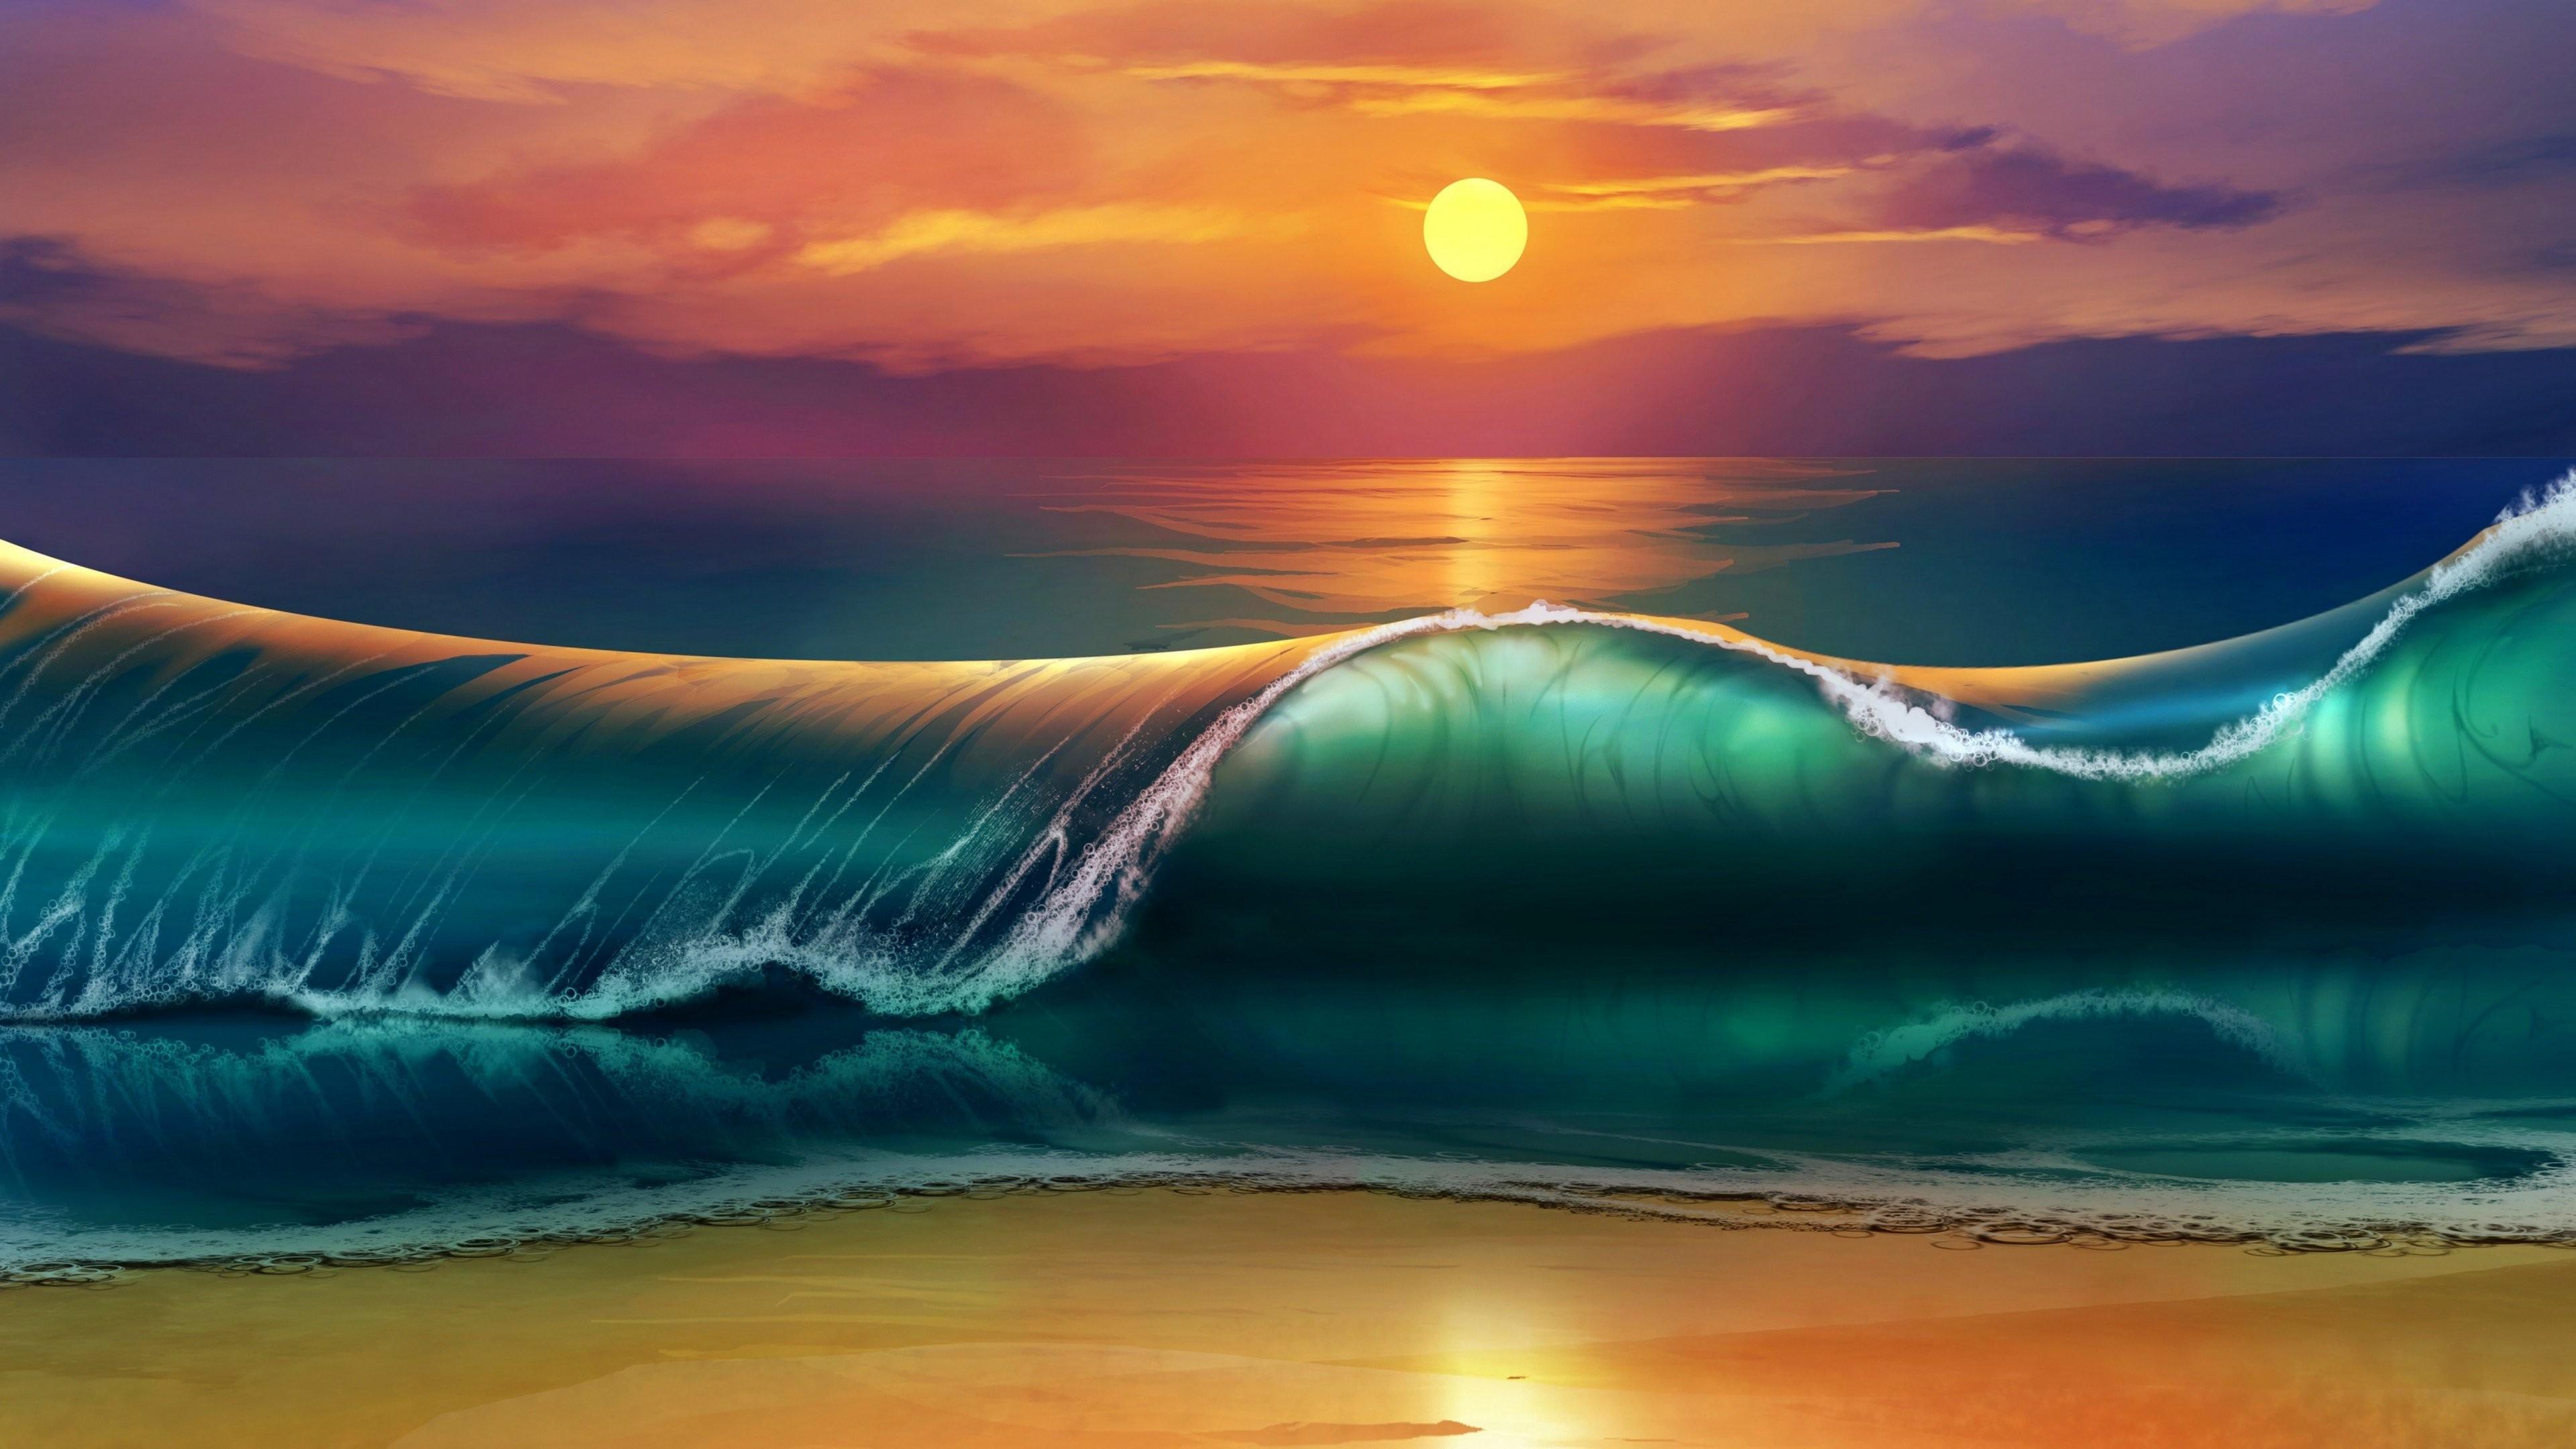 waves sunset minimalism 4k 1540754424 - Waves Sunset Minimalism 4k - waves wallpapers, sunset wallpapers, minimalist wallpapers, minimalism wallpapers, hd-wallpapers, digital art wallpapers, artwork wallpapers, artist wallpapers, 4k-wallpapers